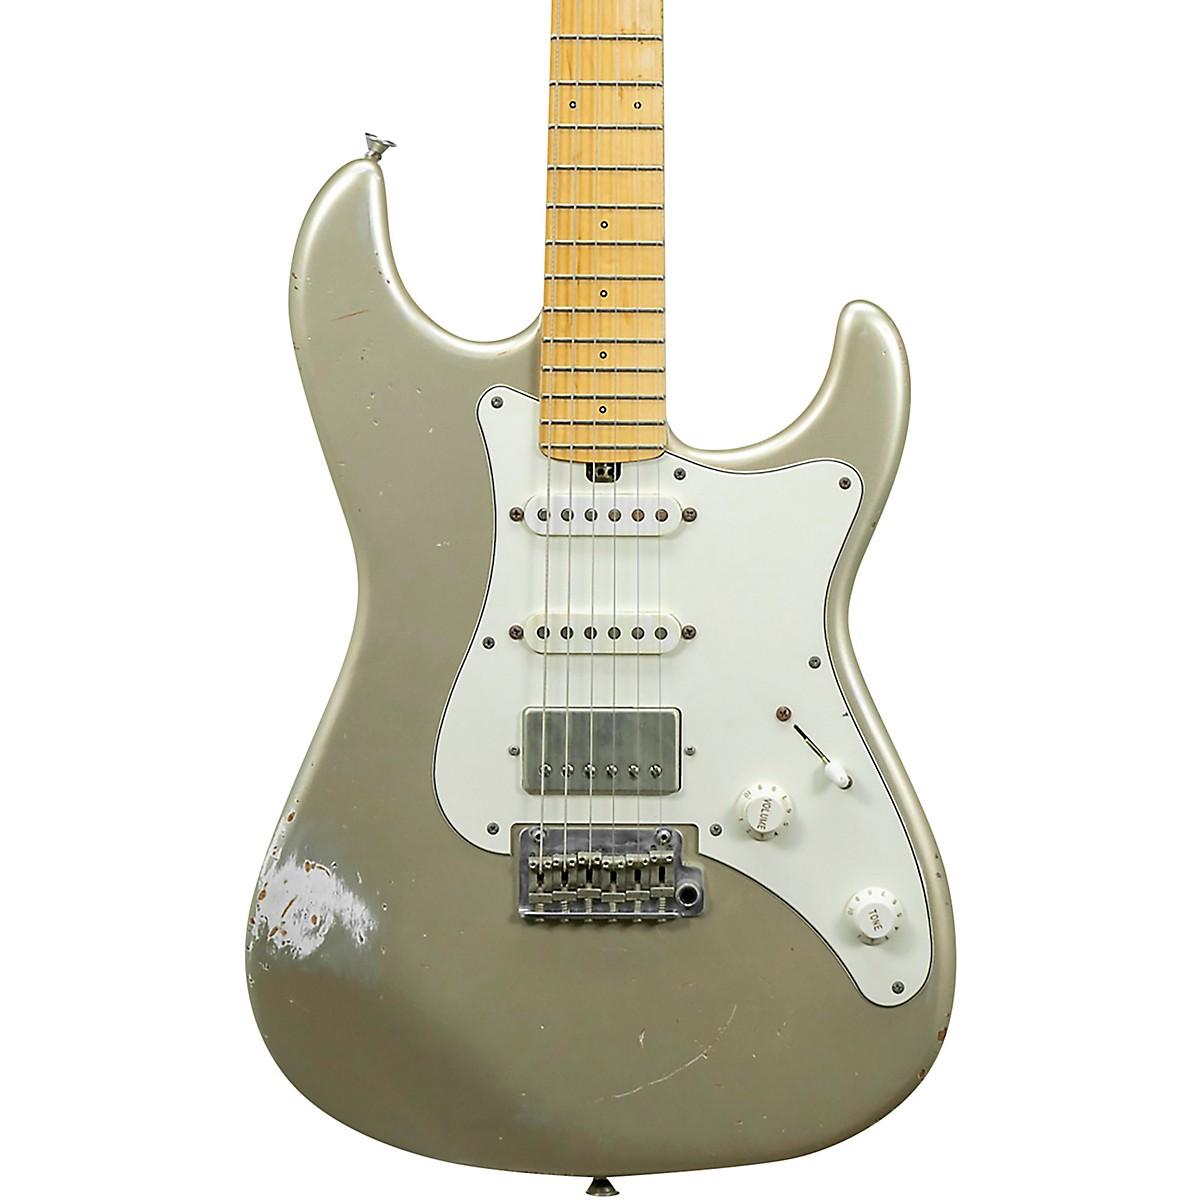 Friedman Vintage-S Aged HSS Electric Guitar